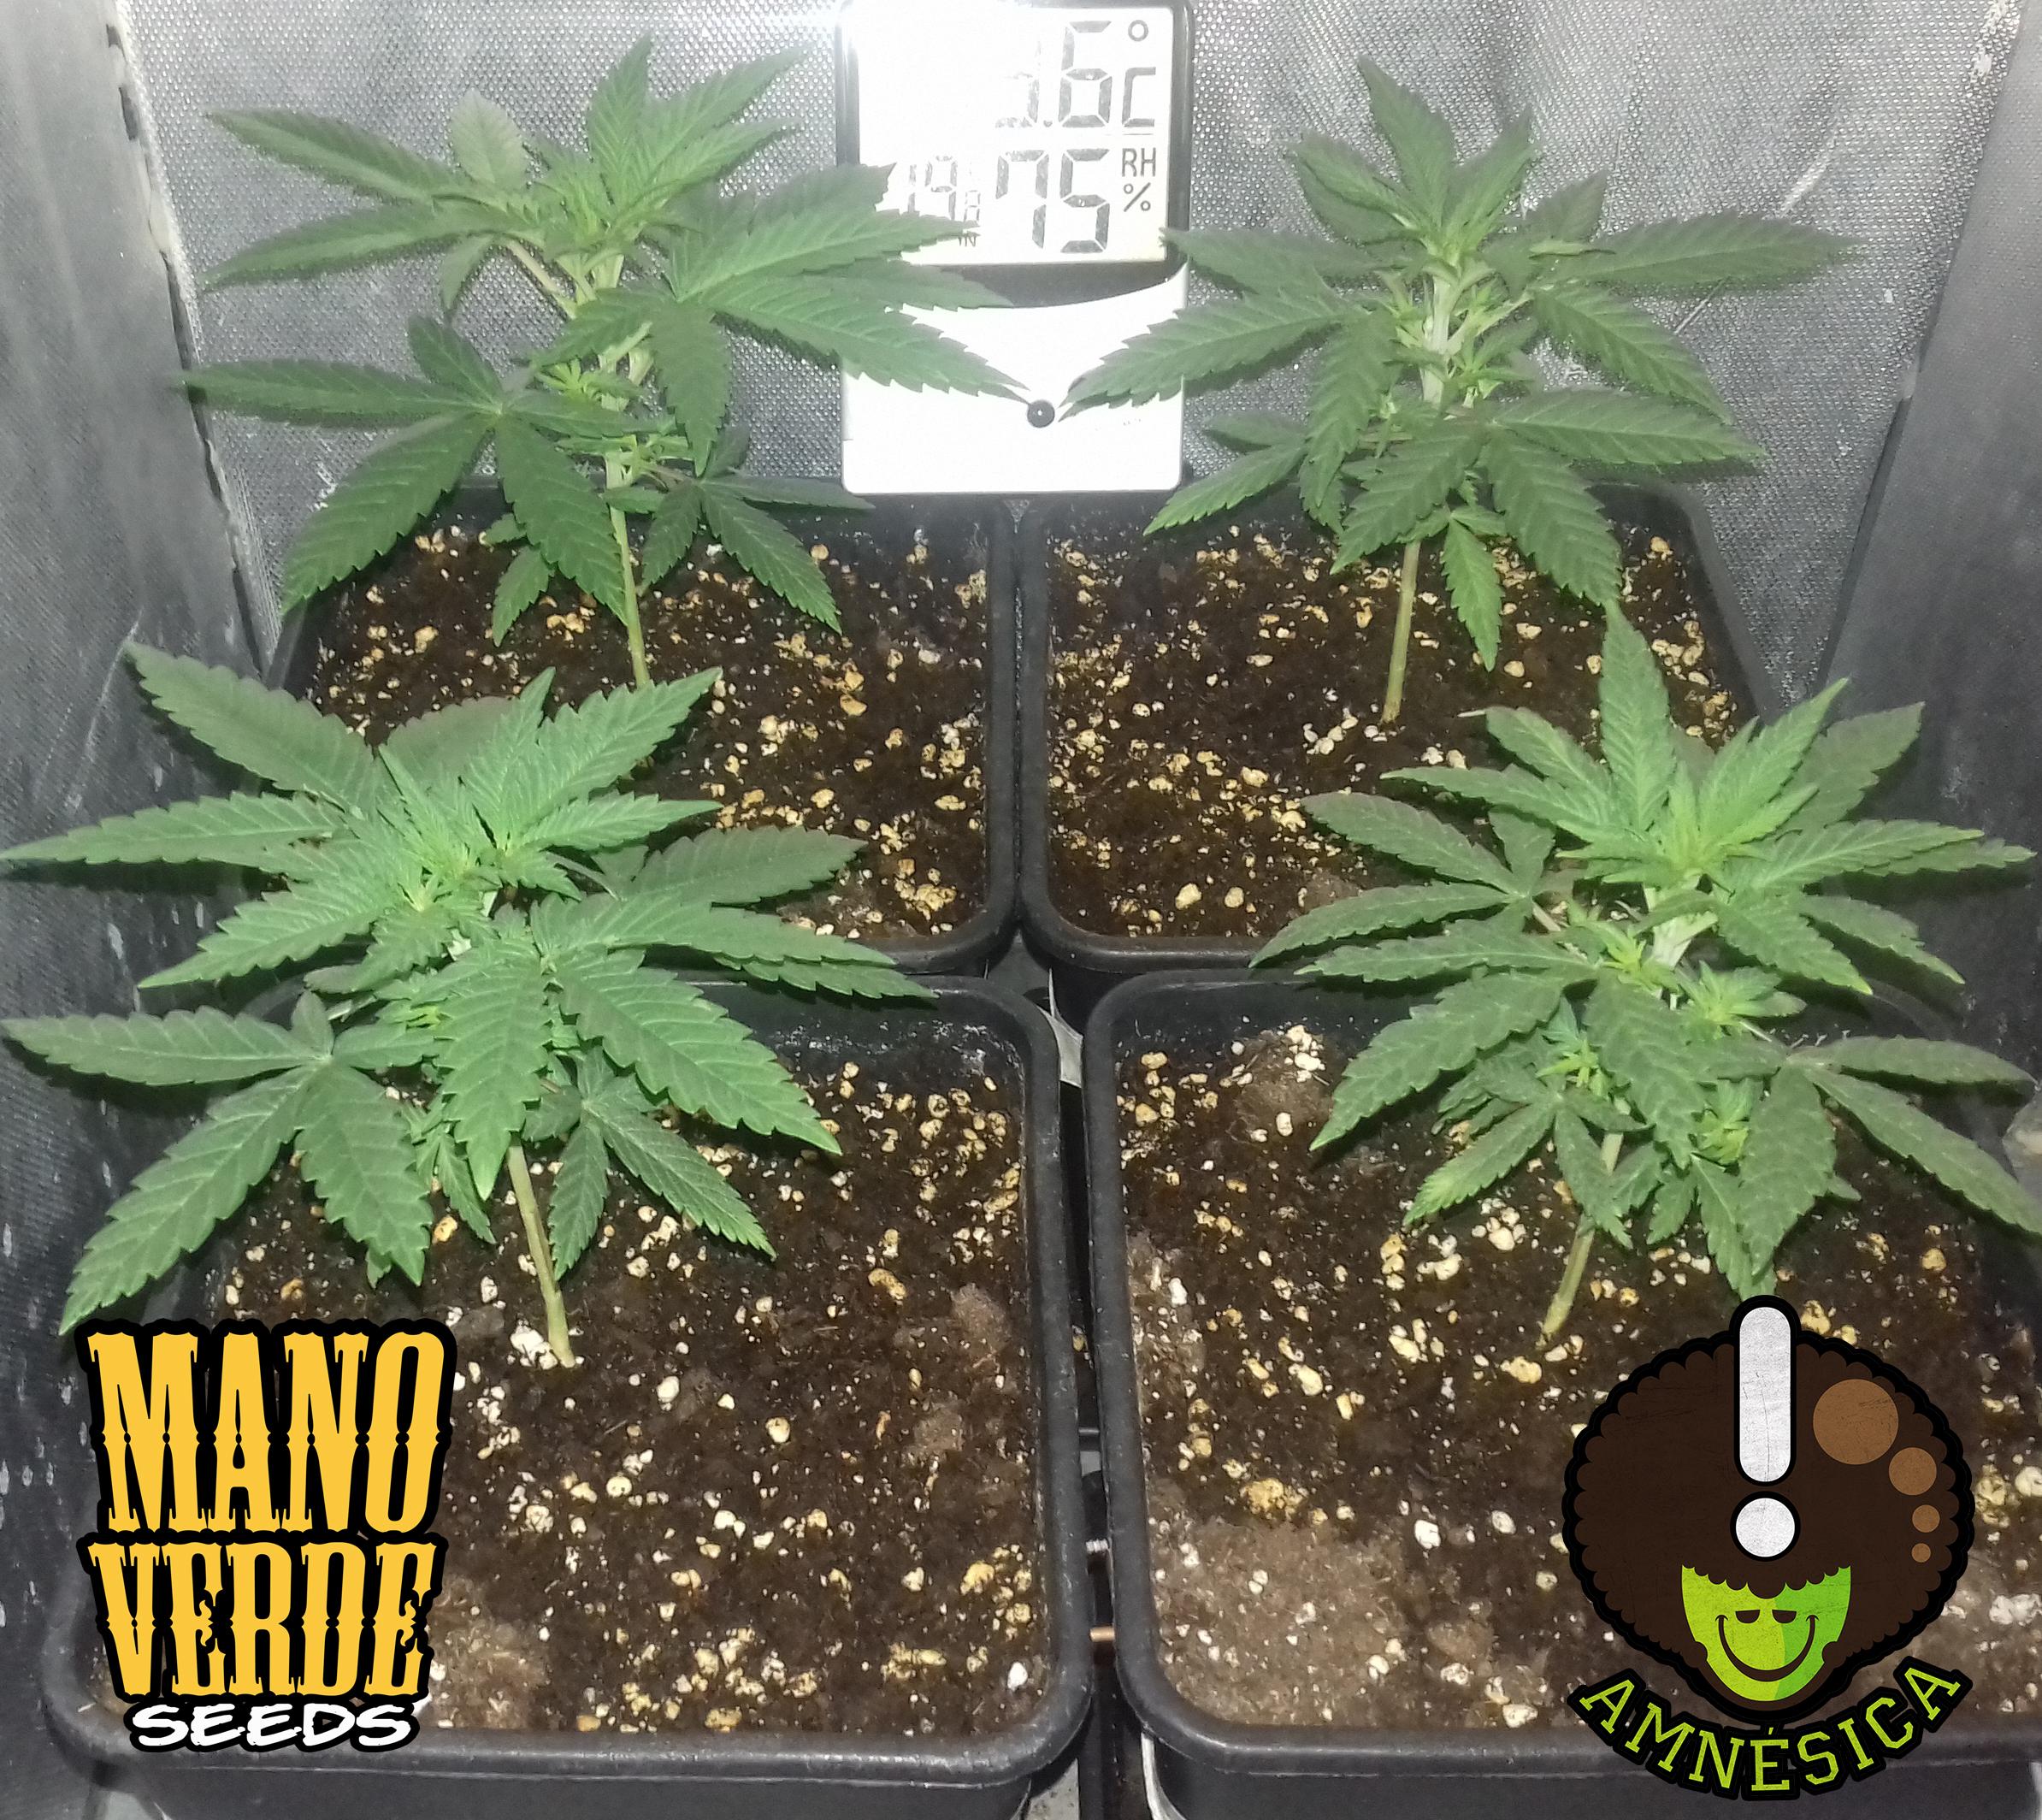 amnesica-manoverde-seeds-16c-7f-230